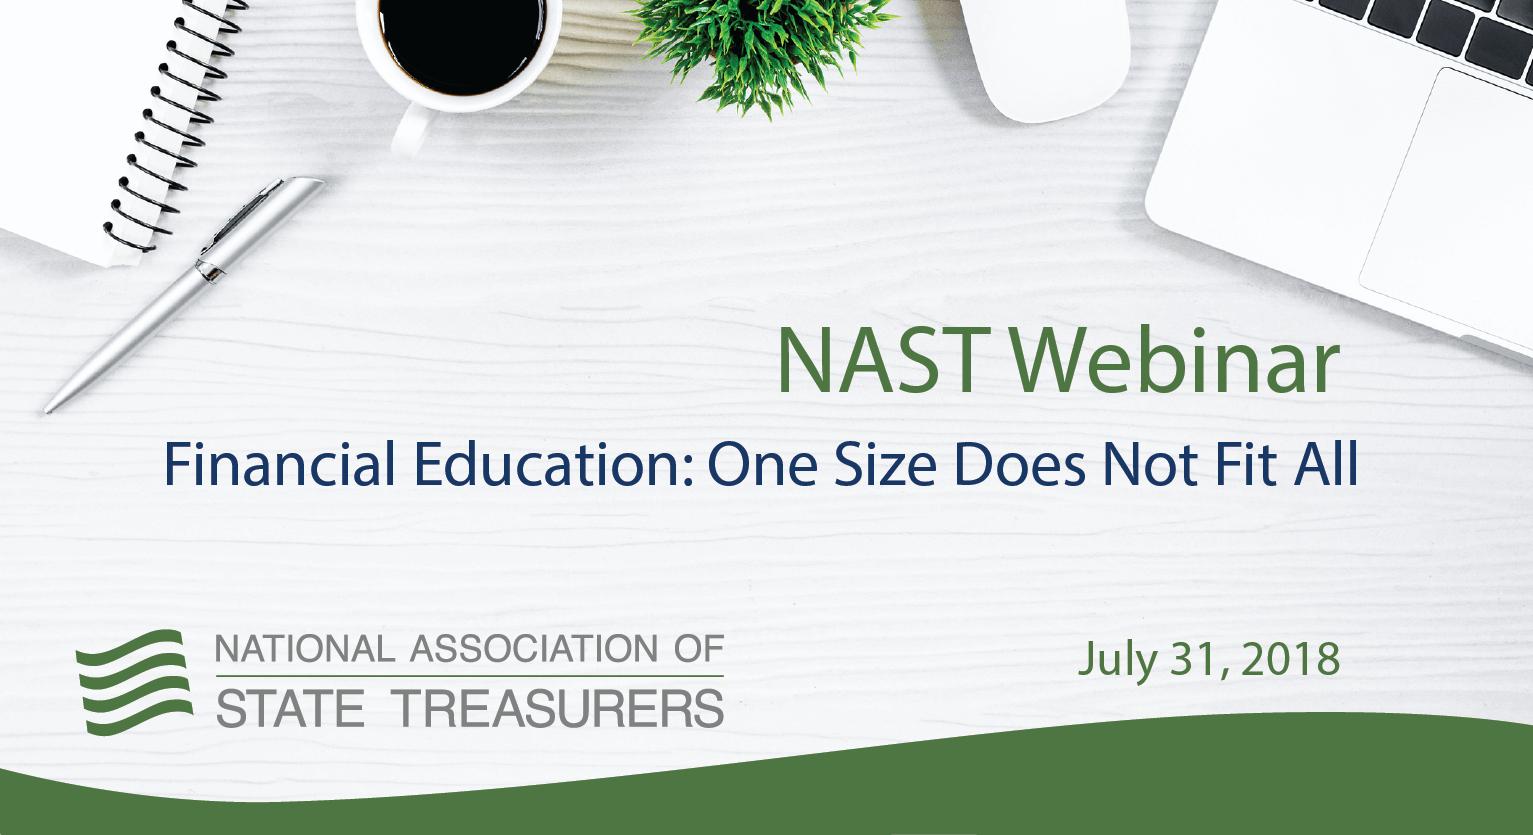 NAST Webinar - Financial Education